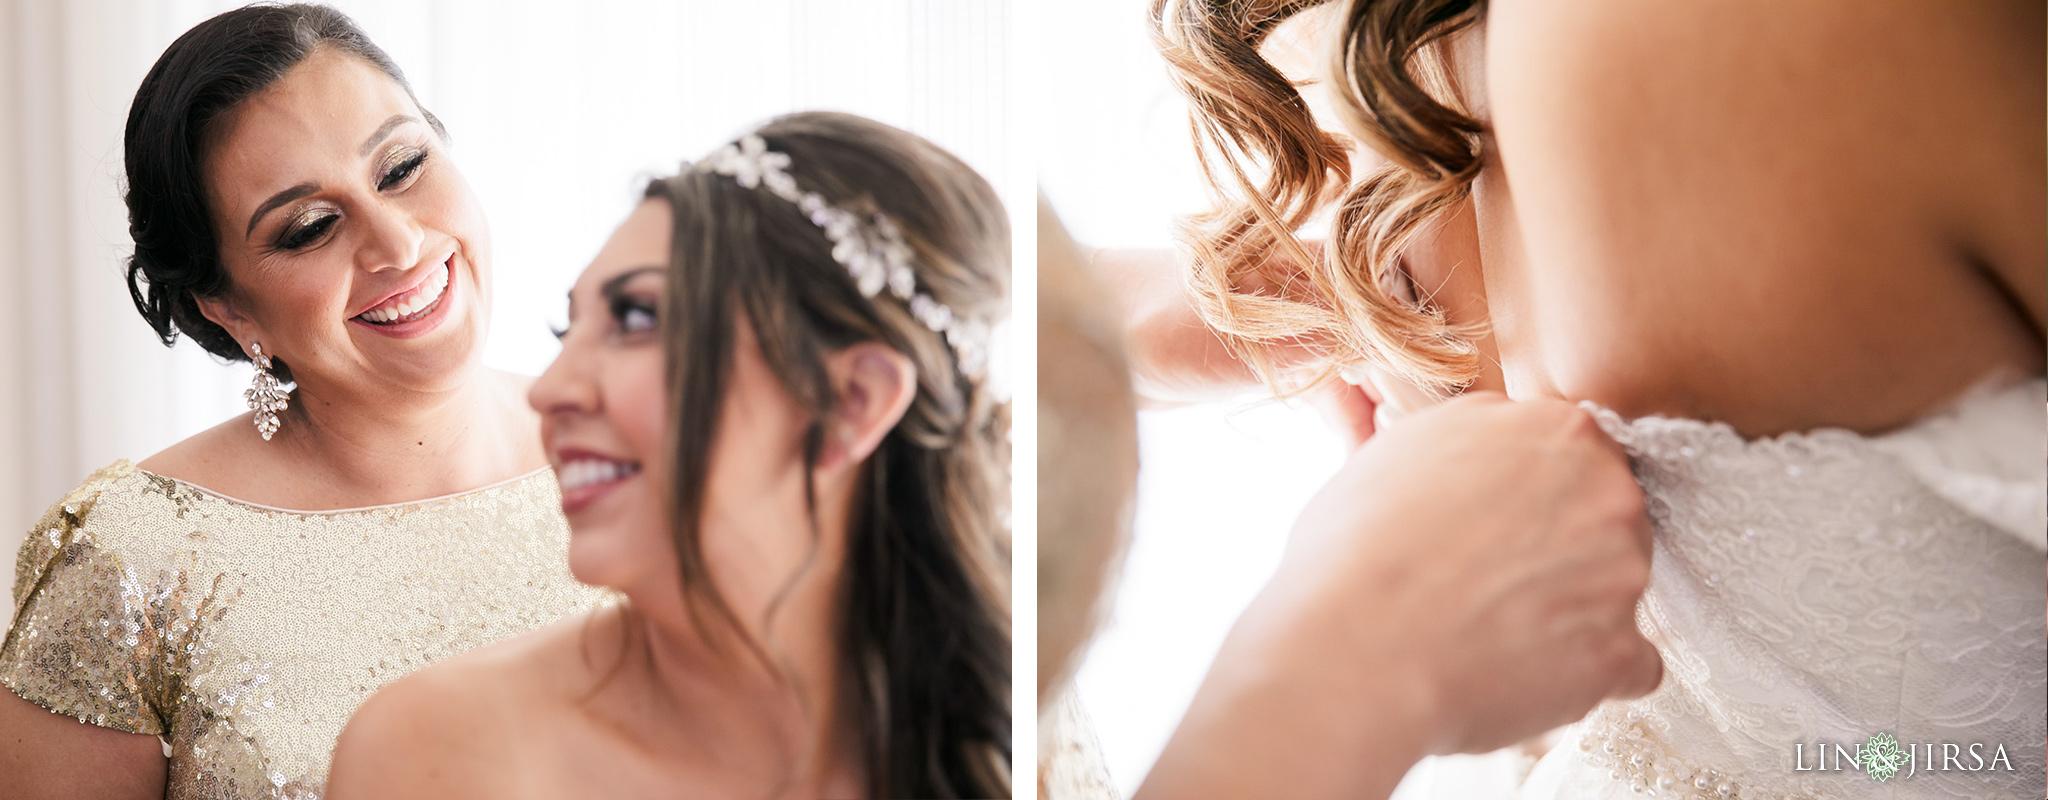 04 Hyatt Regency Huntington Beach Wedding Photography